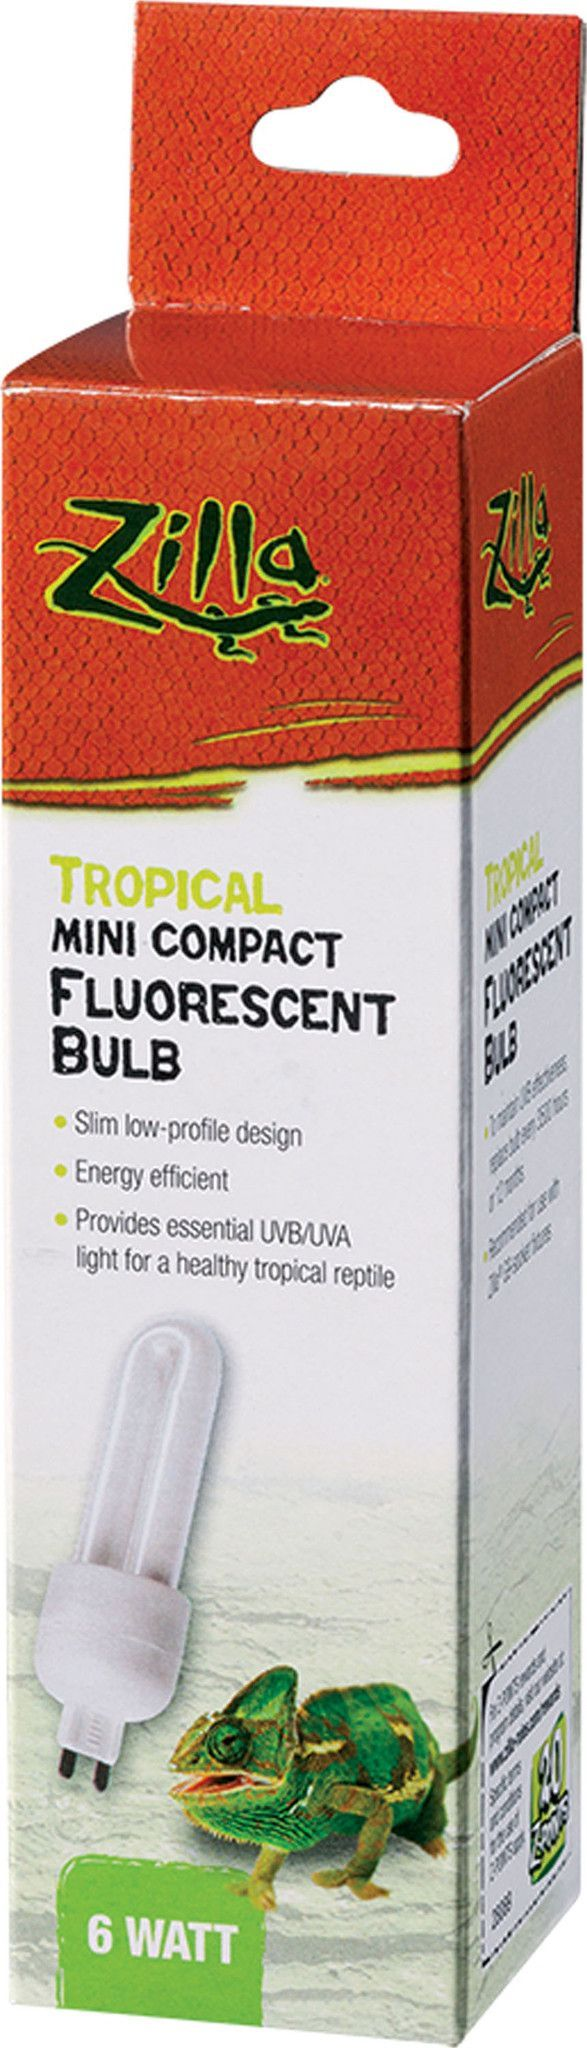 Mini Compact Fluorescent Bulb - Tropical